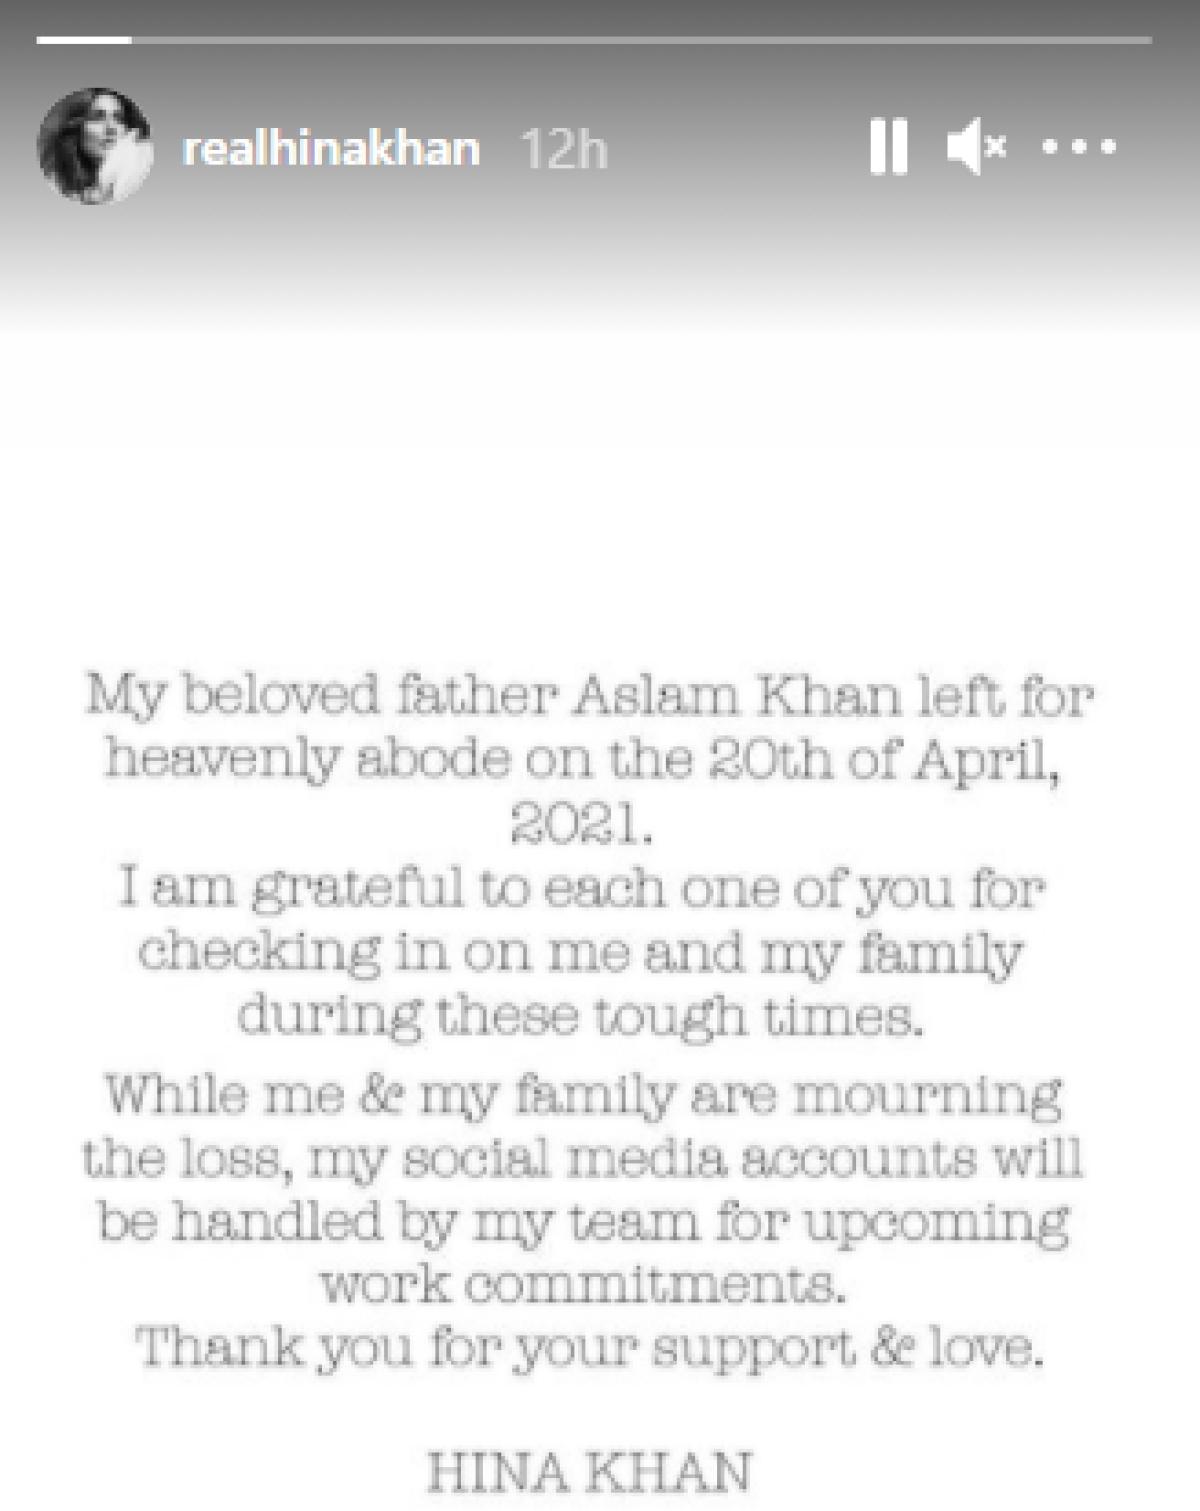 Hina Khan's Instagram story